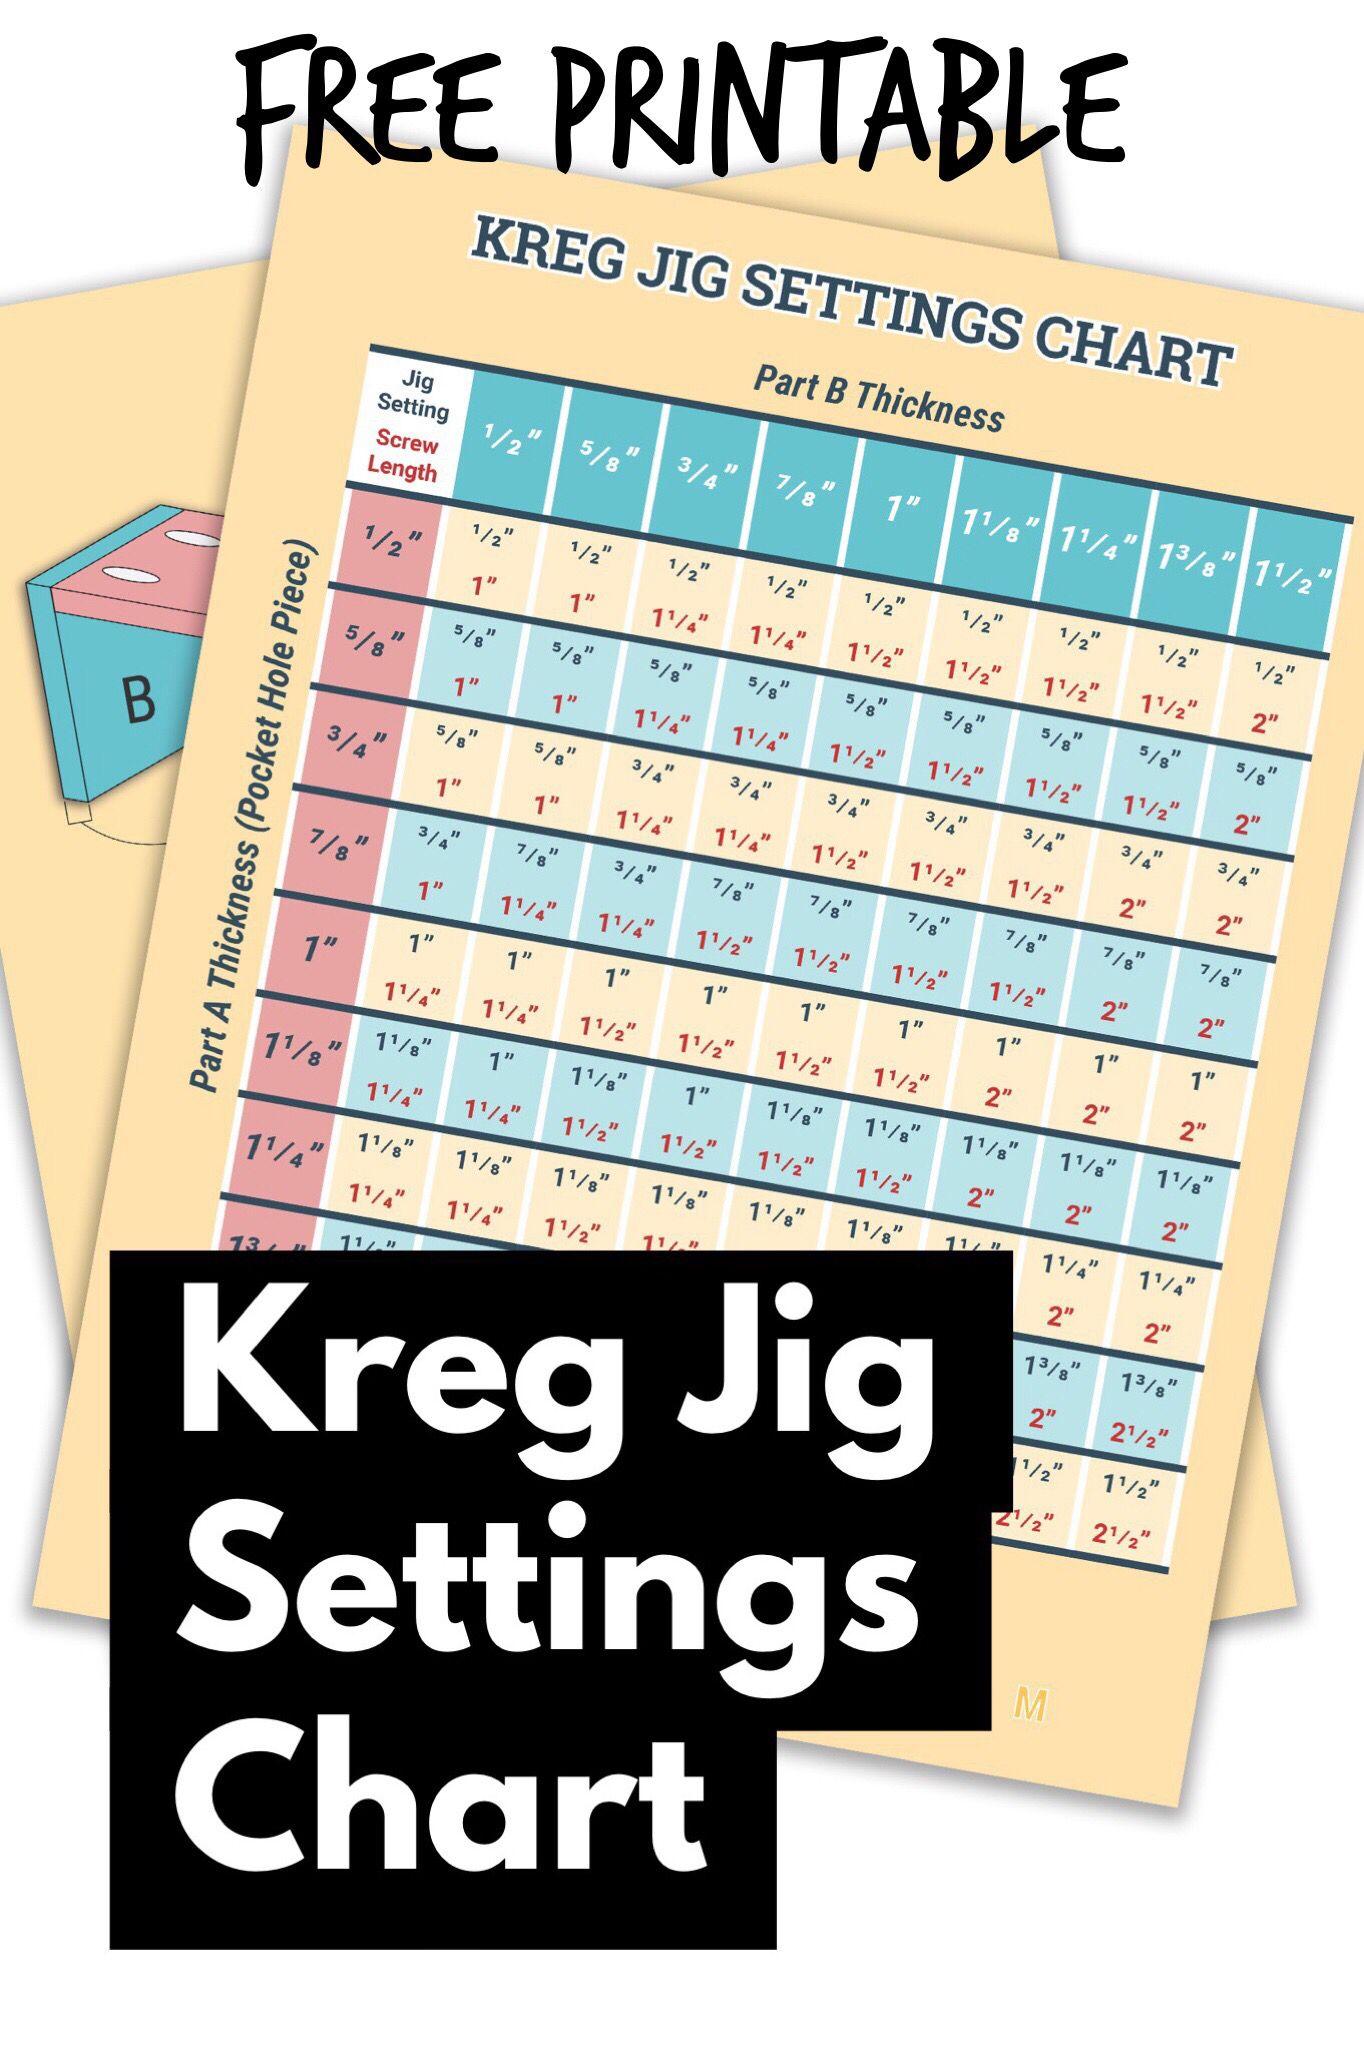 Kreg Jig Screw Chart : screw, chart, Settings, Chart, Calculator, Pocket